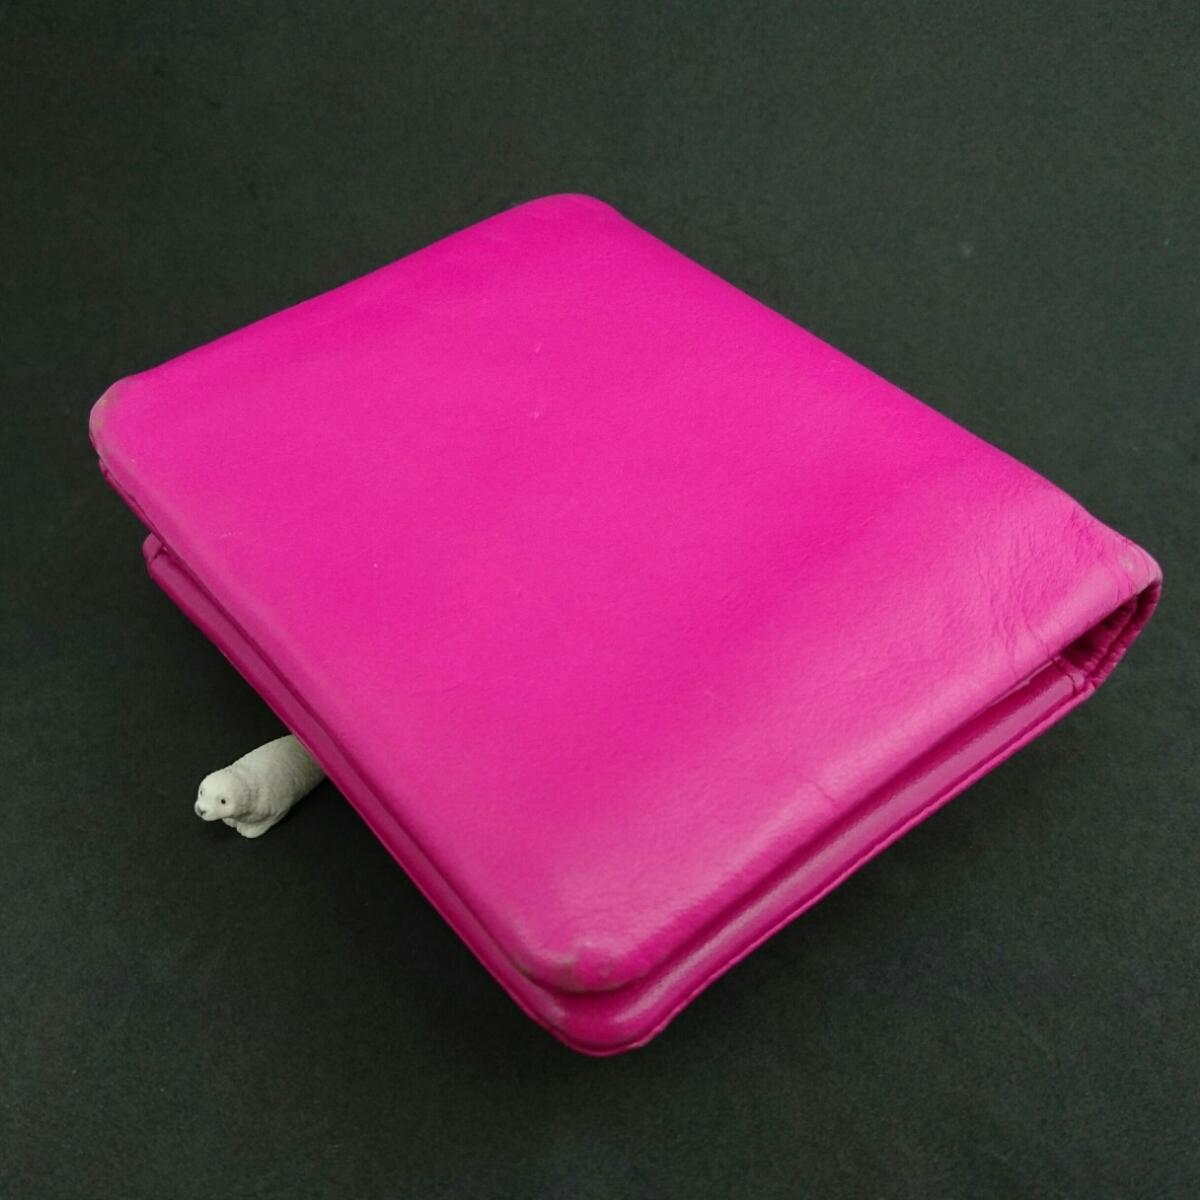 d11e0239c715 agnes b. アニエスベー 牛革 2つ折り財布 ピンク 中古 G 365|品牌|价格 ...